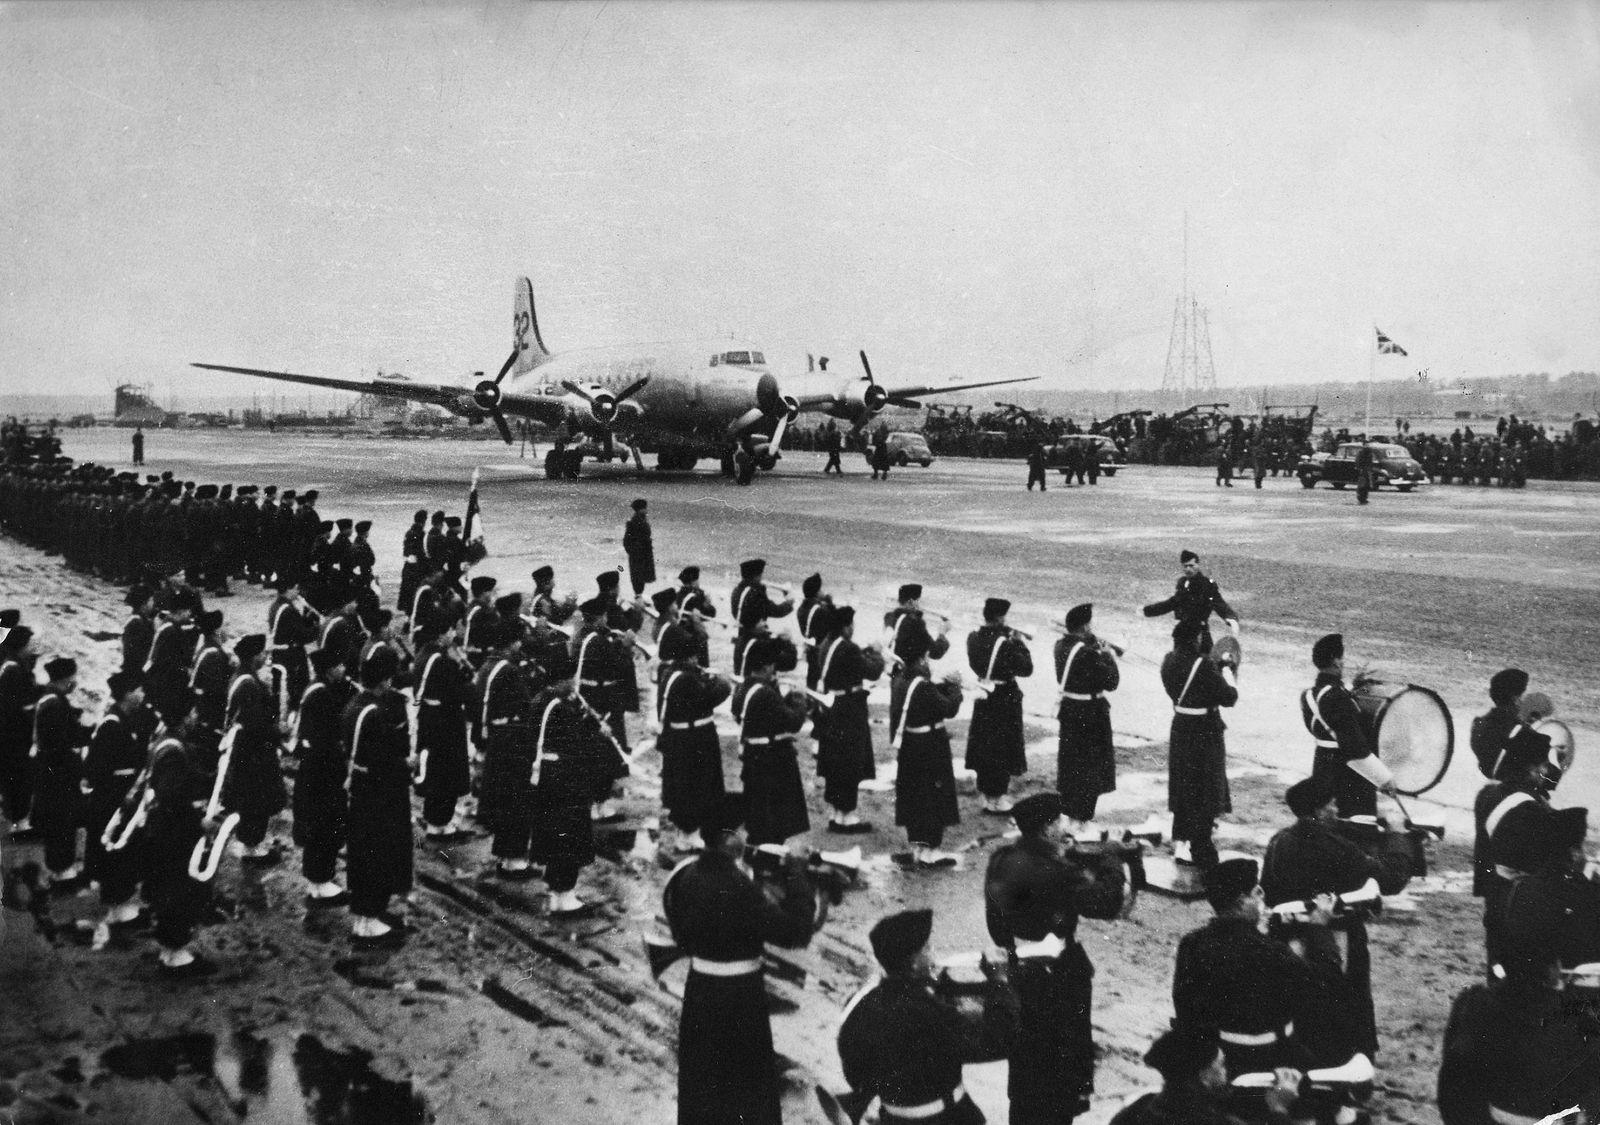 Blockade Berlin 1948/49 - Musikkorps begruesst das 1. Flugzeug d. US Air Force in Tegel